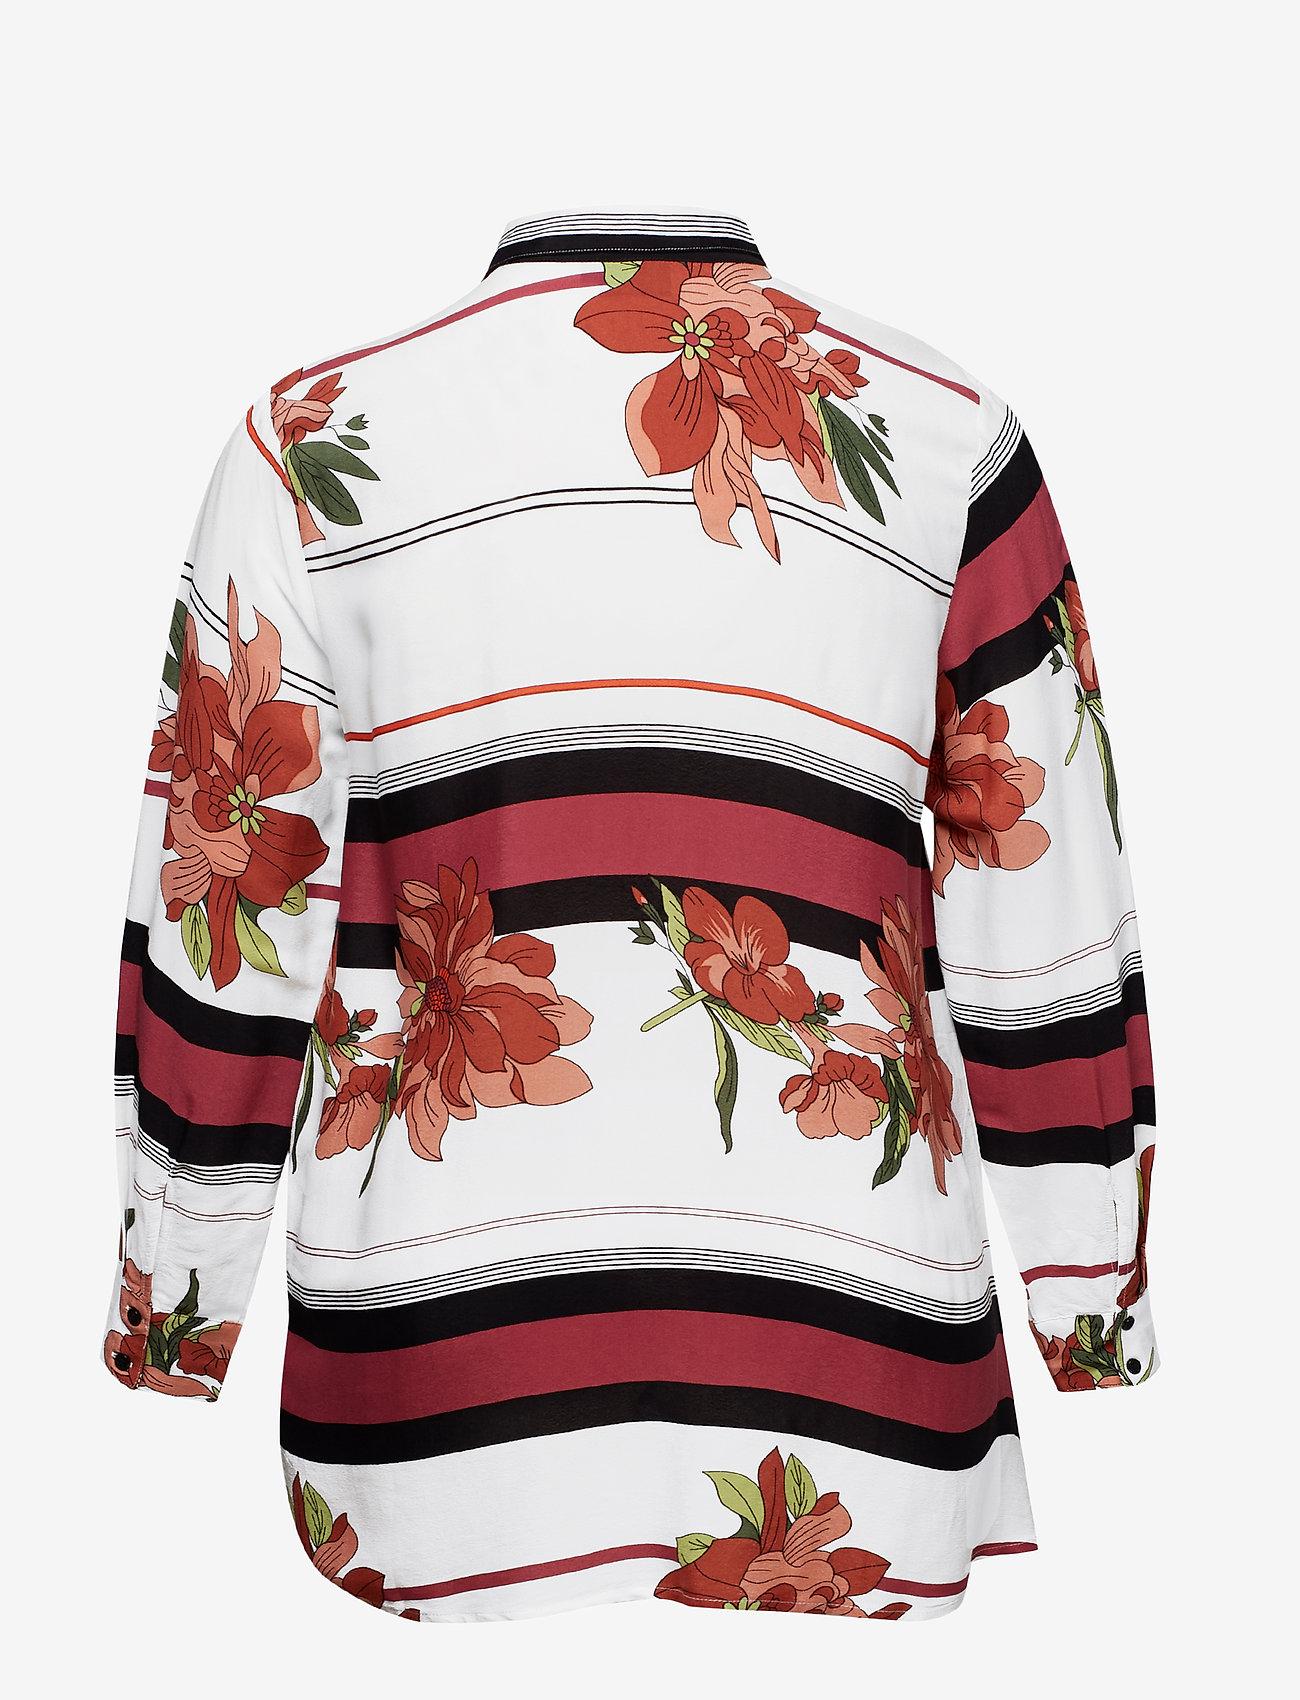 Zizzi Mmarikka, L/s, Shirt - Blusar & Skjortor White